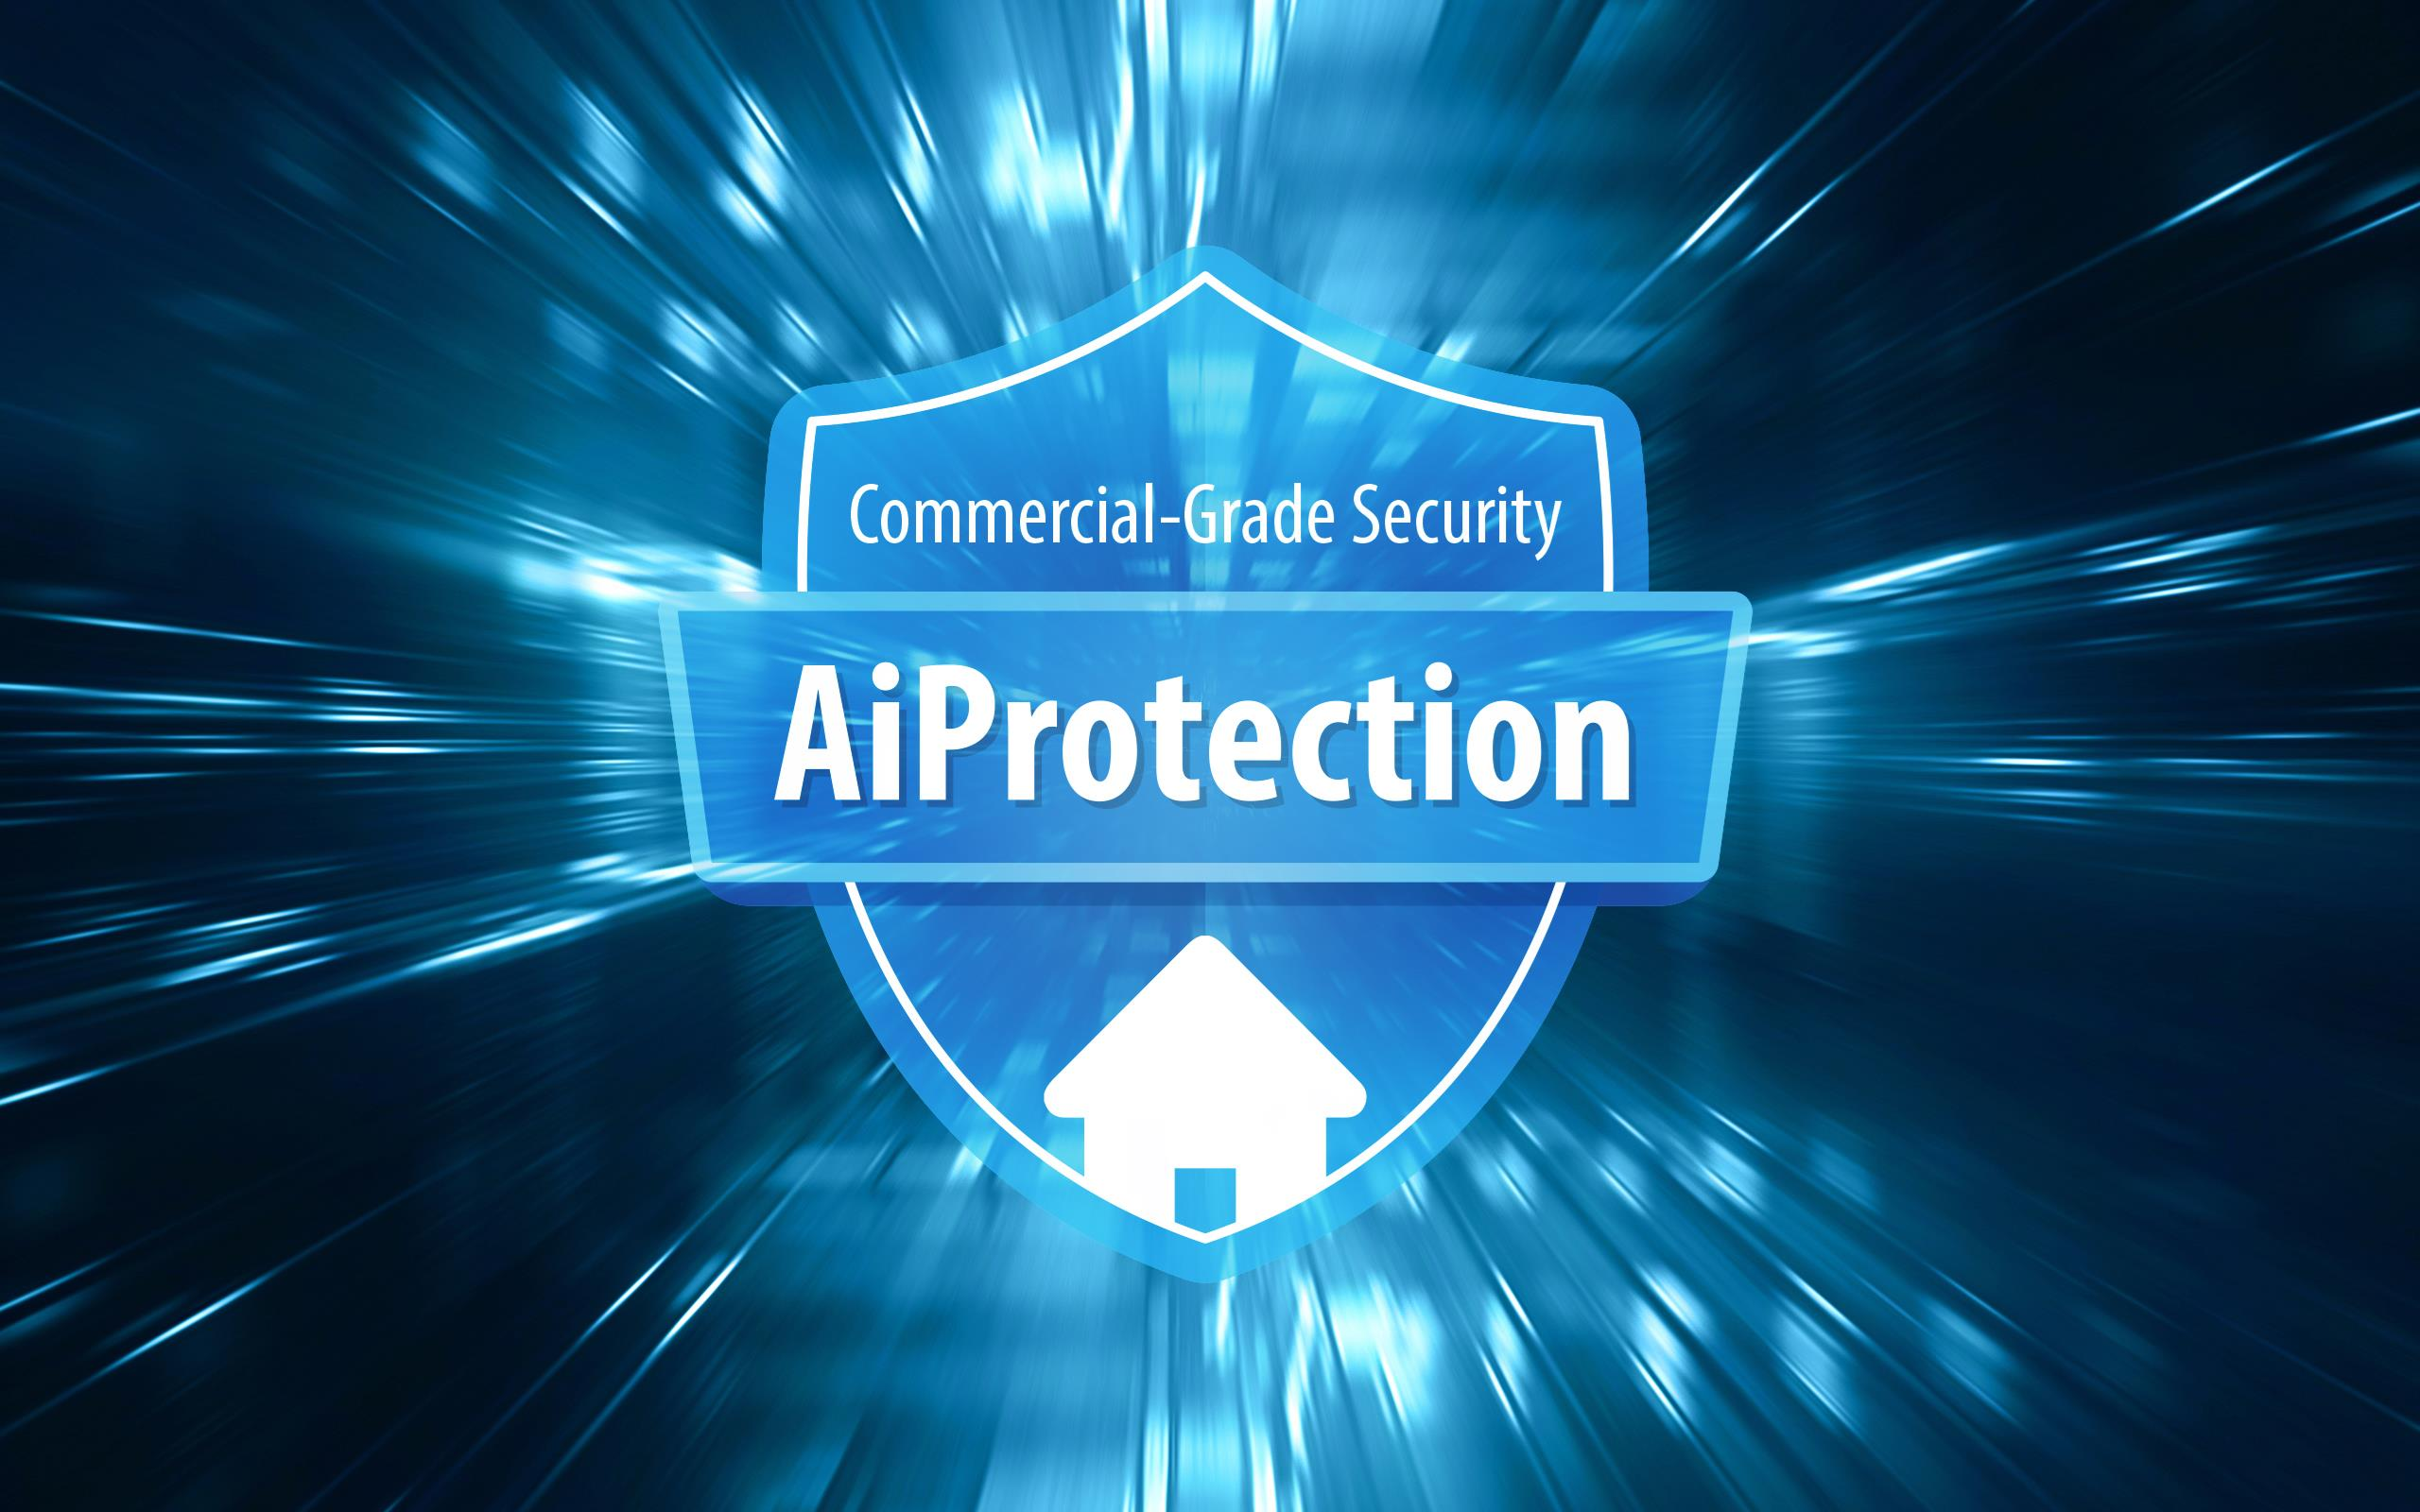 AiProtection & Parental Controls